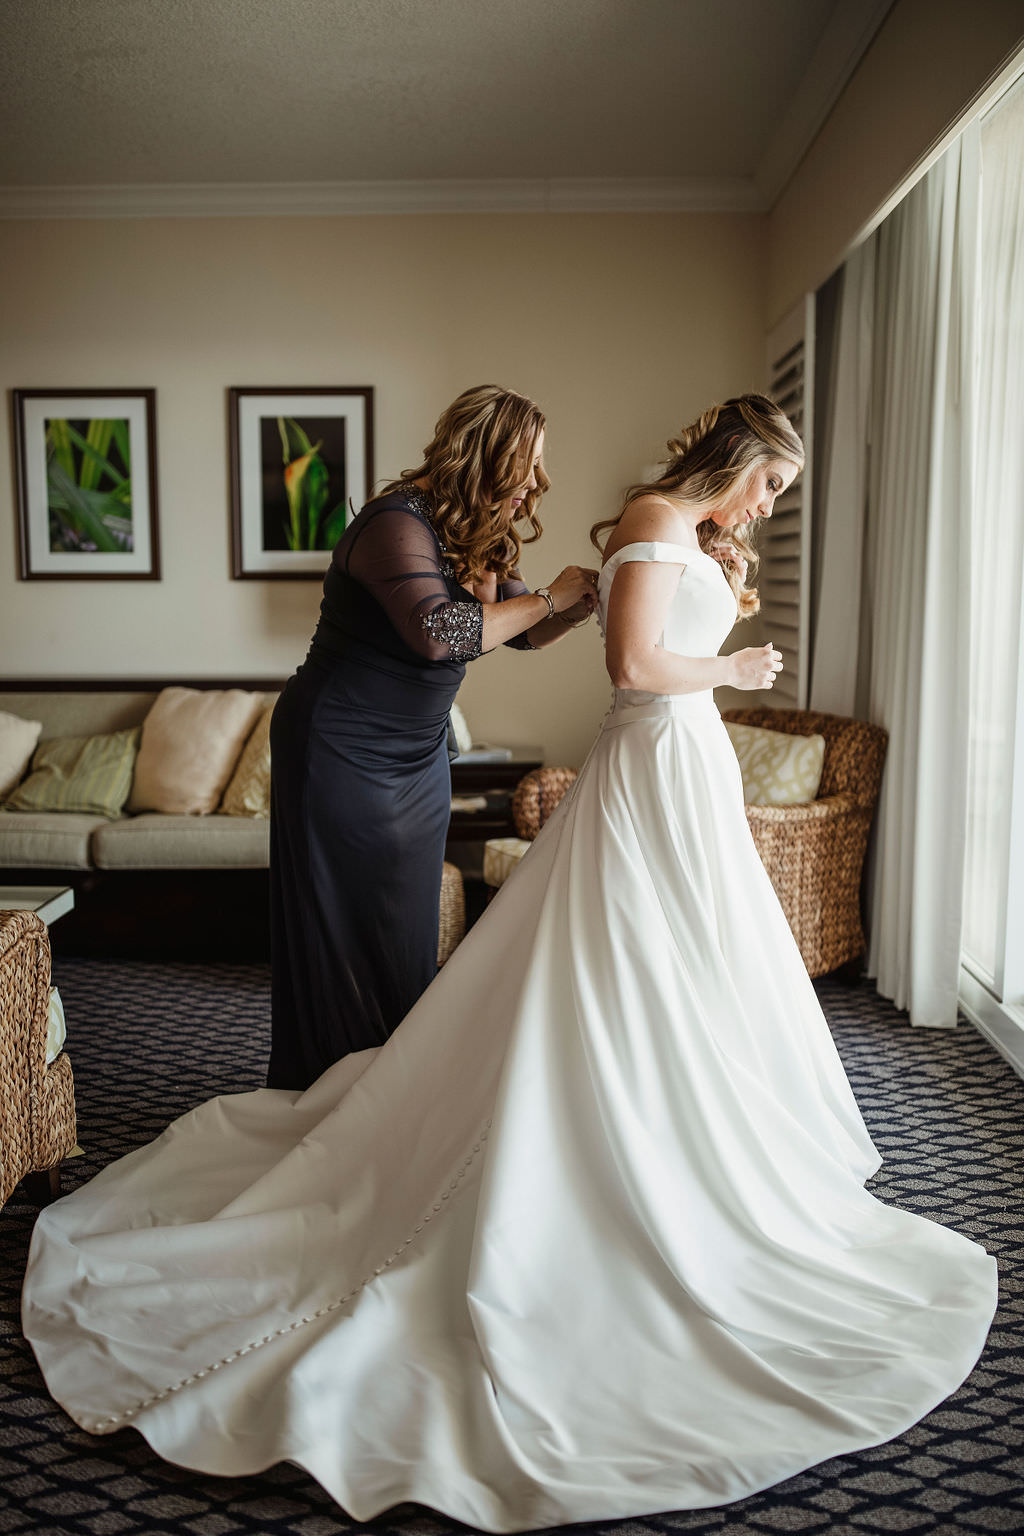 Florida Classic Bride Getting Ready Photo in White Off the Shoulder Ballgown Calla Blanche Wedding Dress